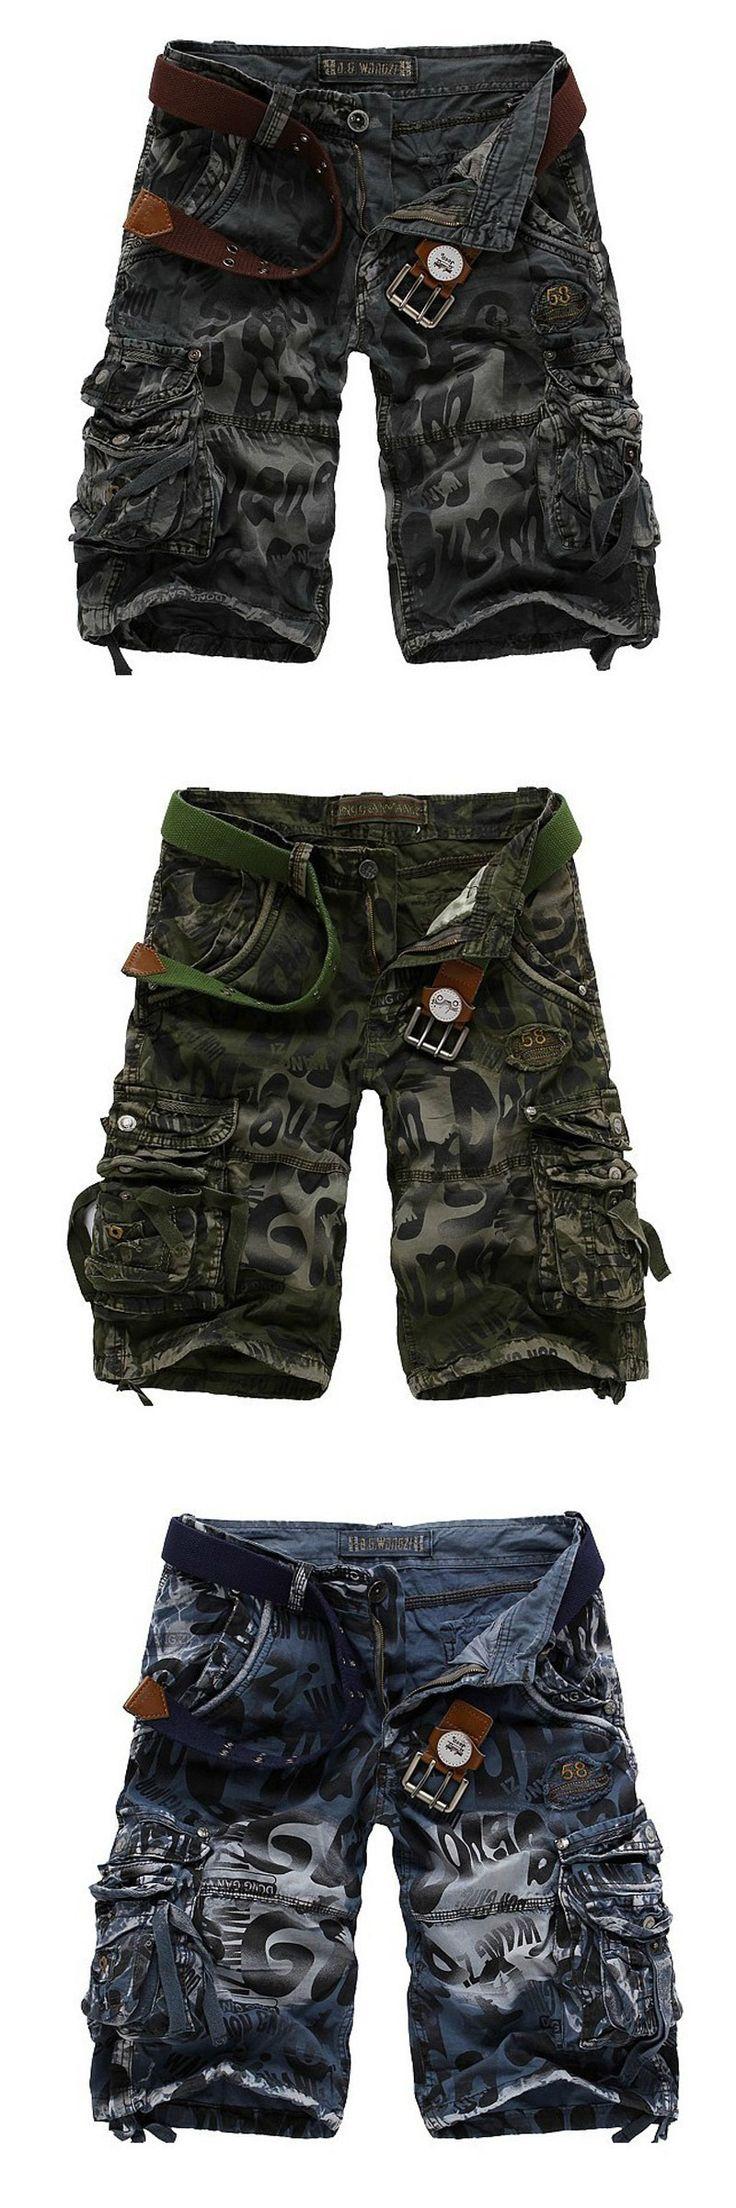 New 2017 New Tooling Shorts Thin Multi-pocket tooling camouflage Work shorts Men fashion lager size fashion shorts Men A1985